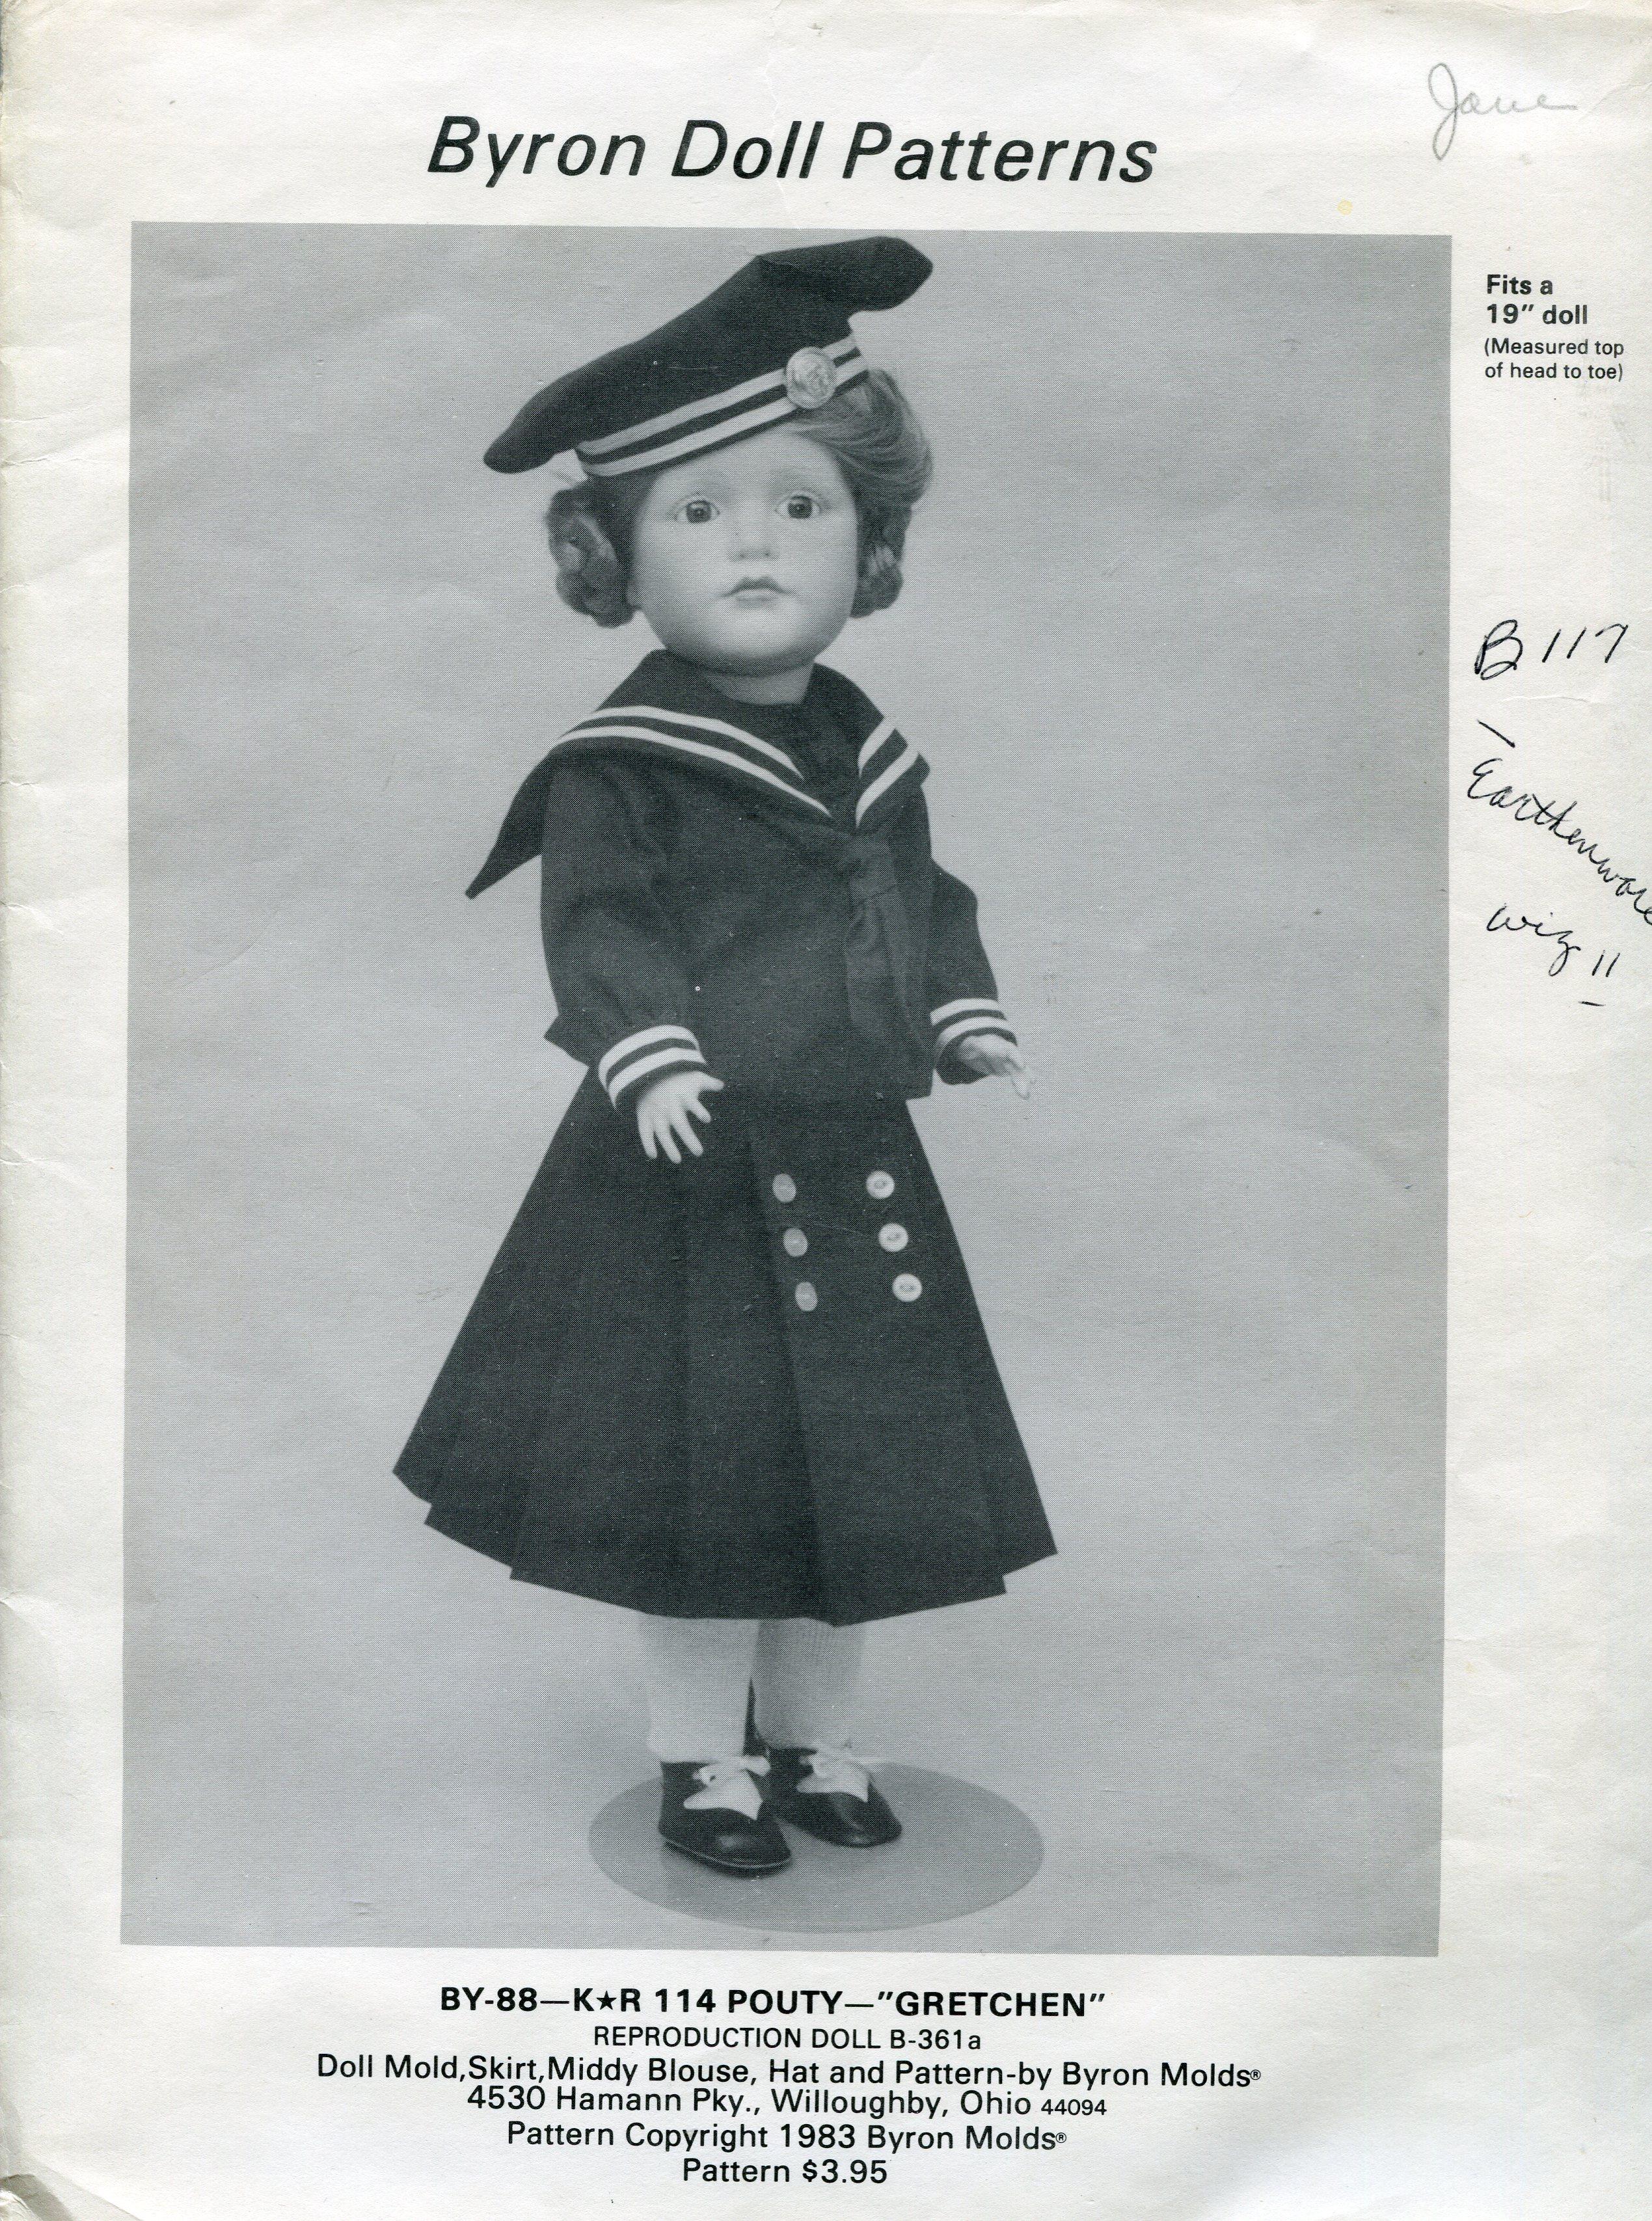 Byron Doll Patterns BY-88